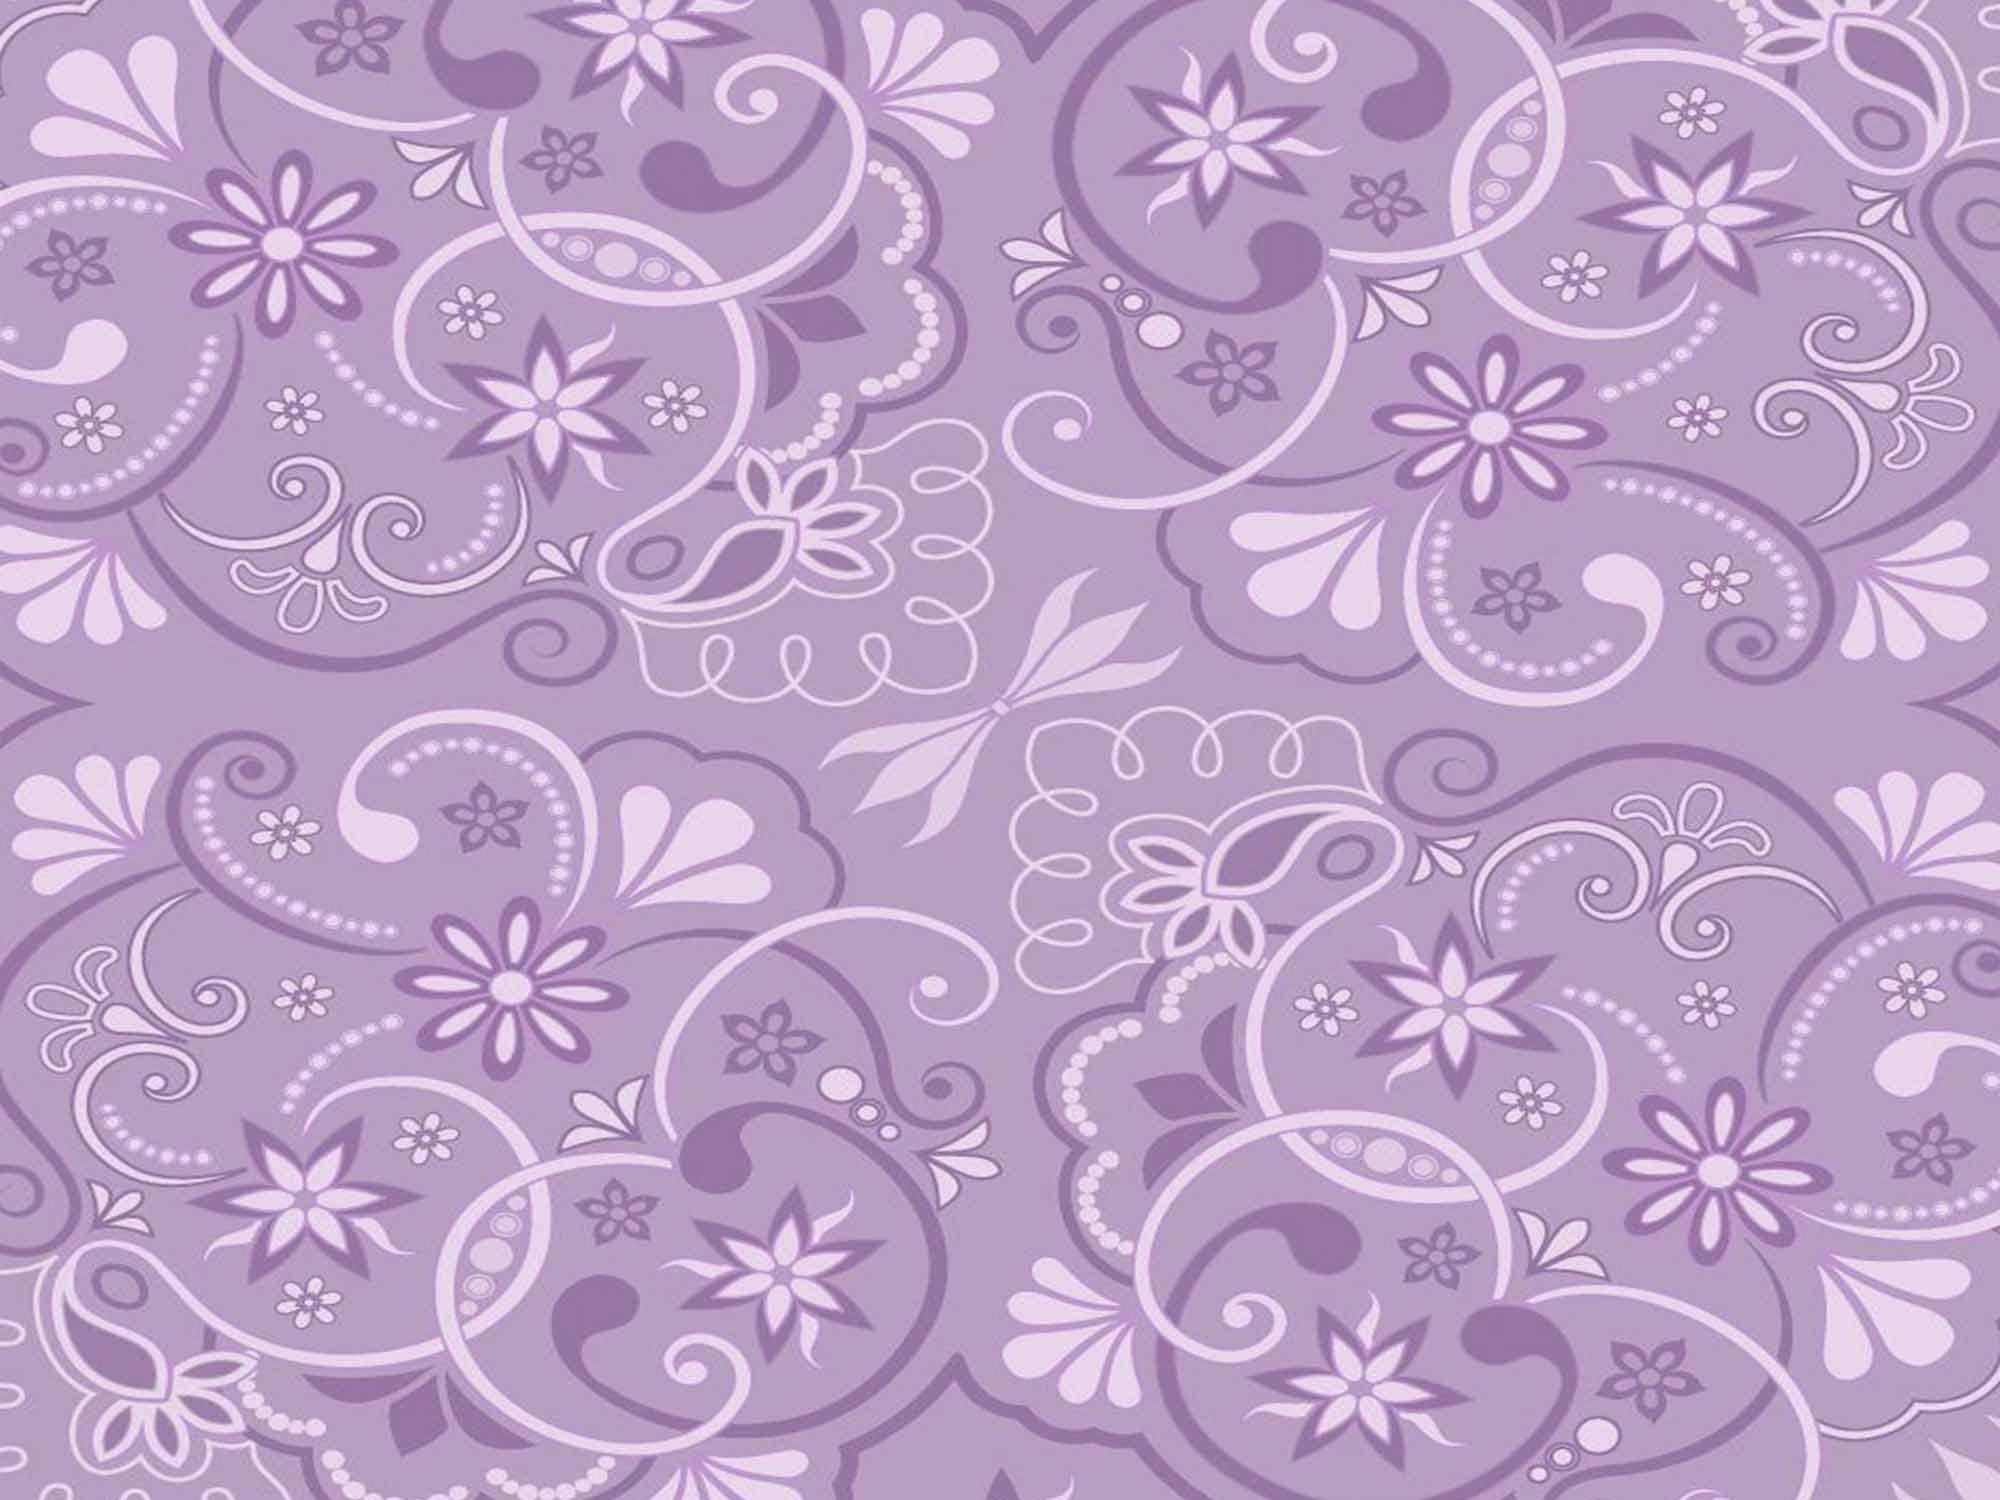 Papel de Parede Floral 0111 - Adesivos de Parede  - Paredes Decoradas